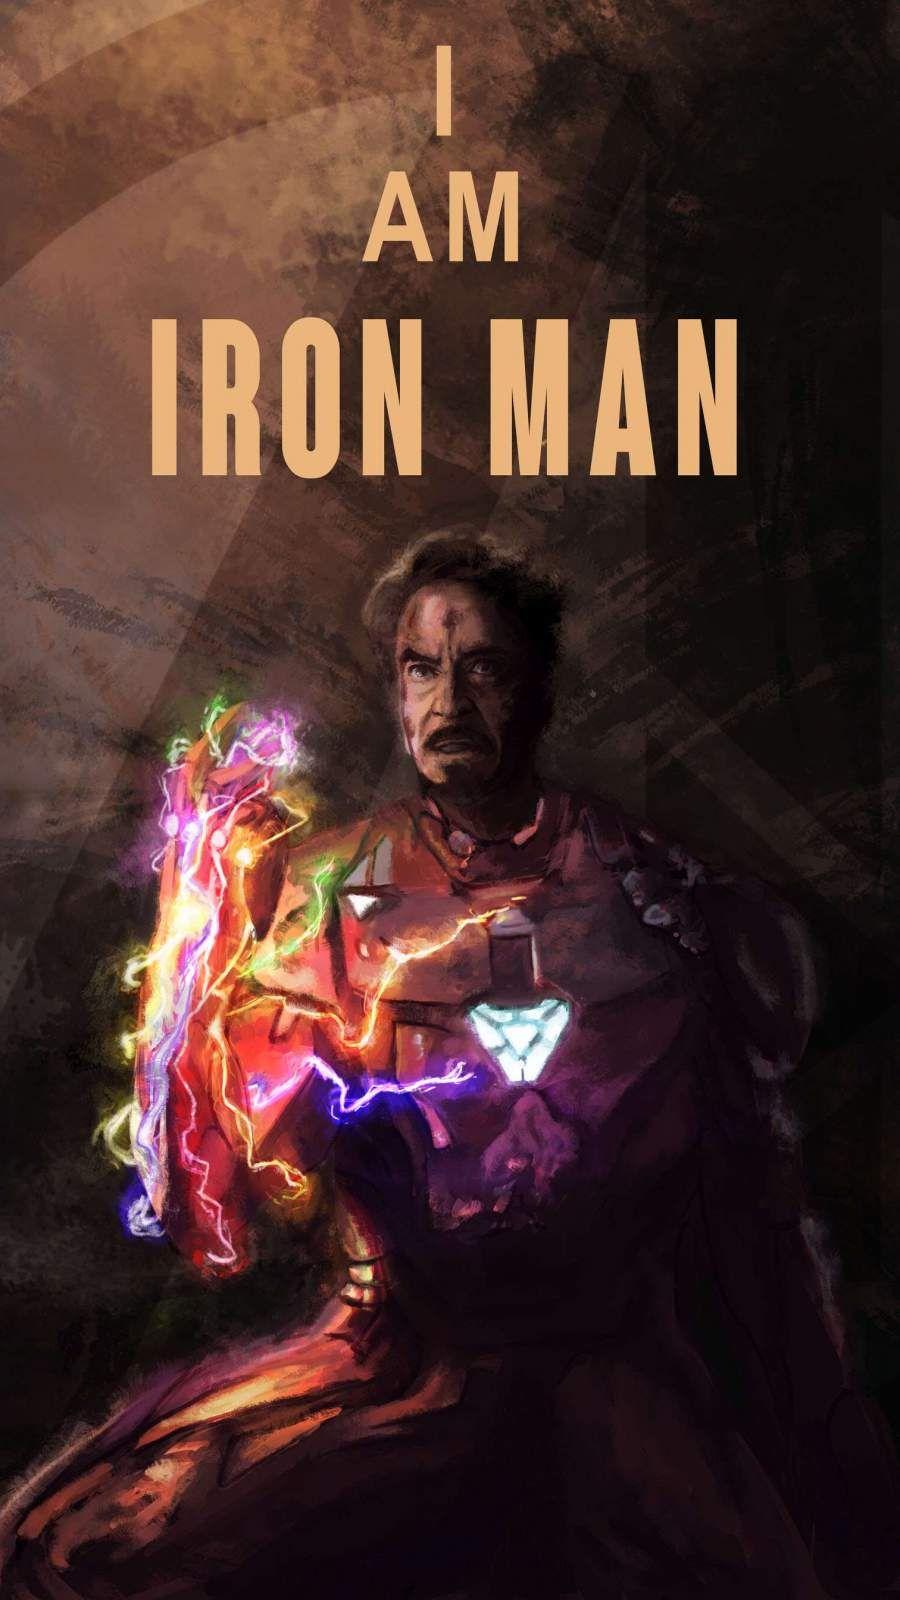 Iron Man Sacrifice Infinity Stone Snap Iphone Wallpaper Iron Man Marvel Wallpaper Iron Man Wallpaper